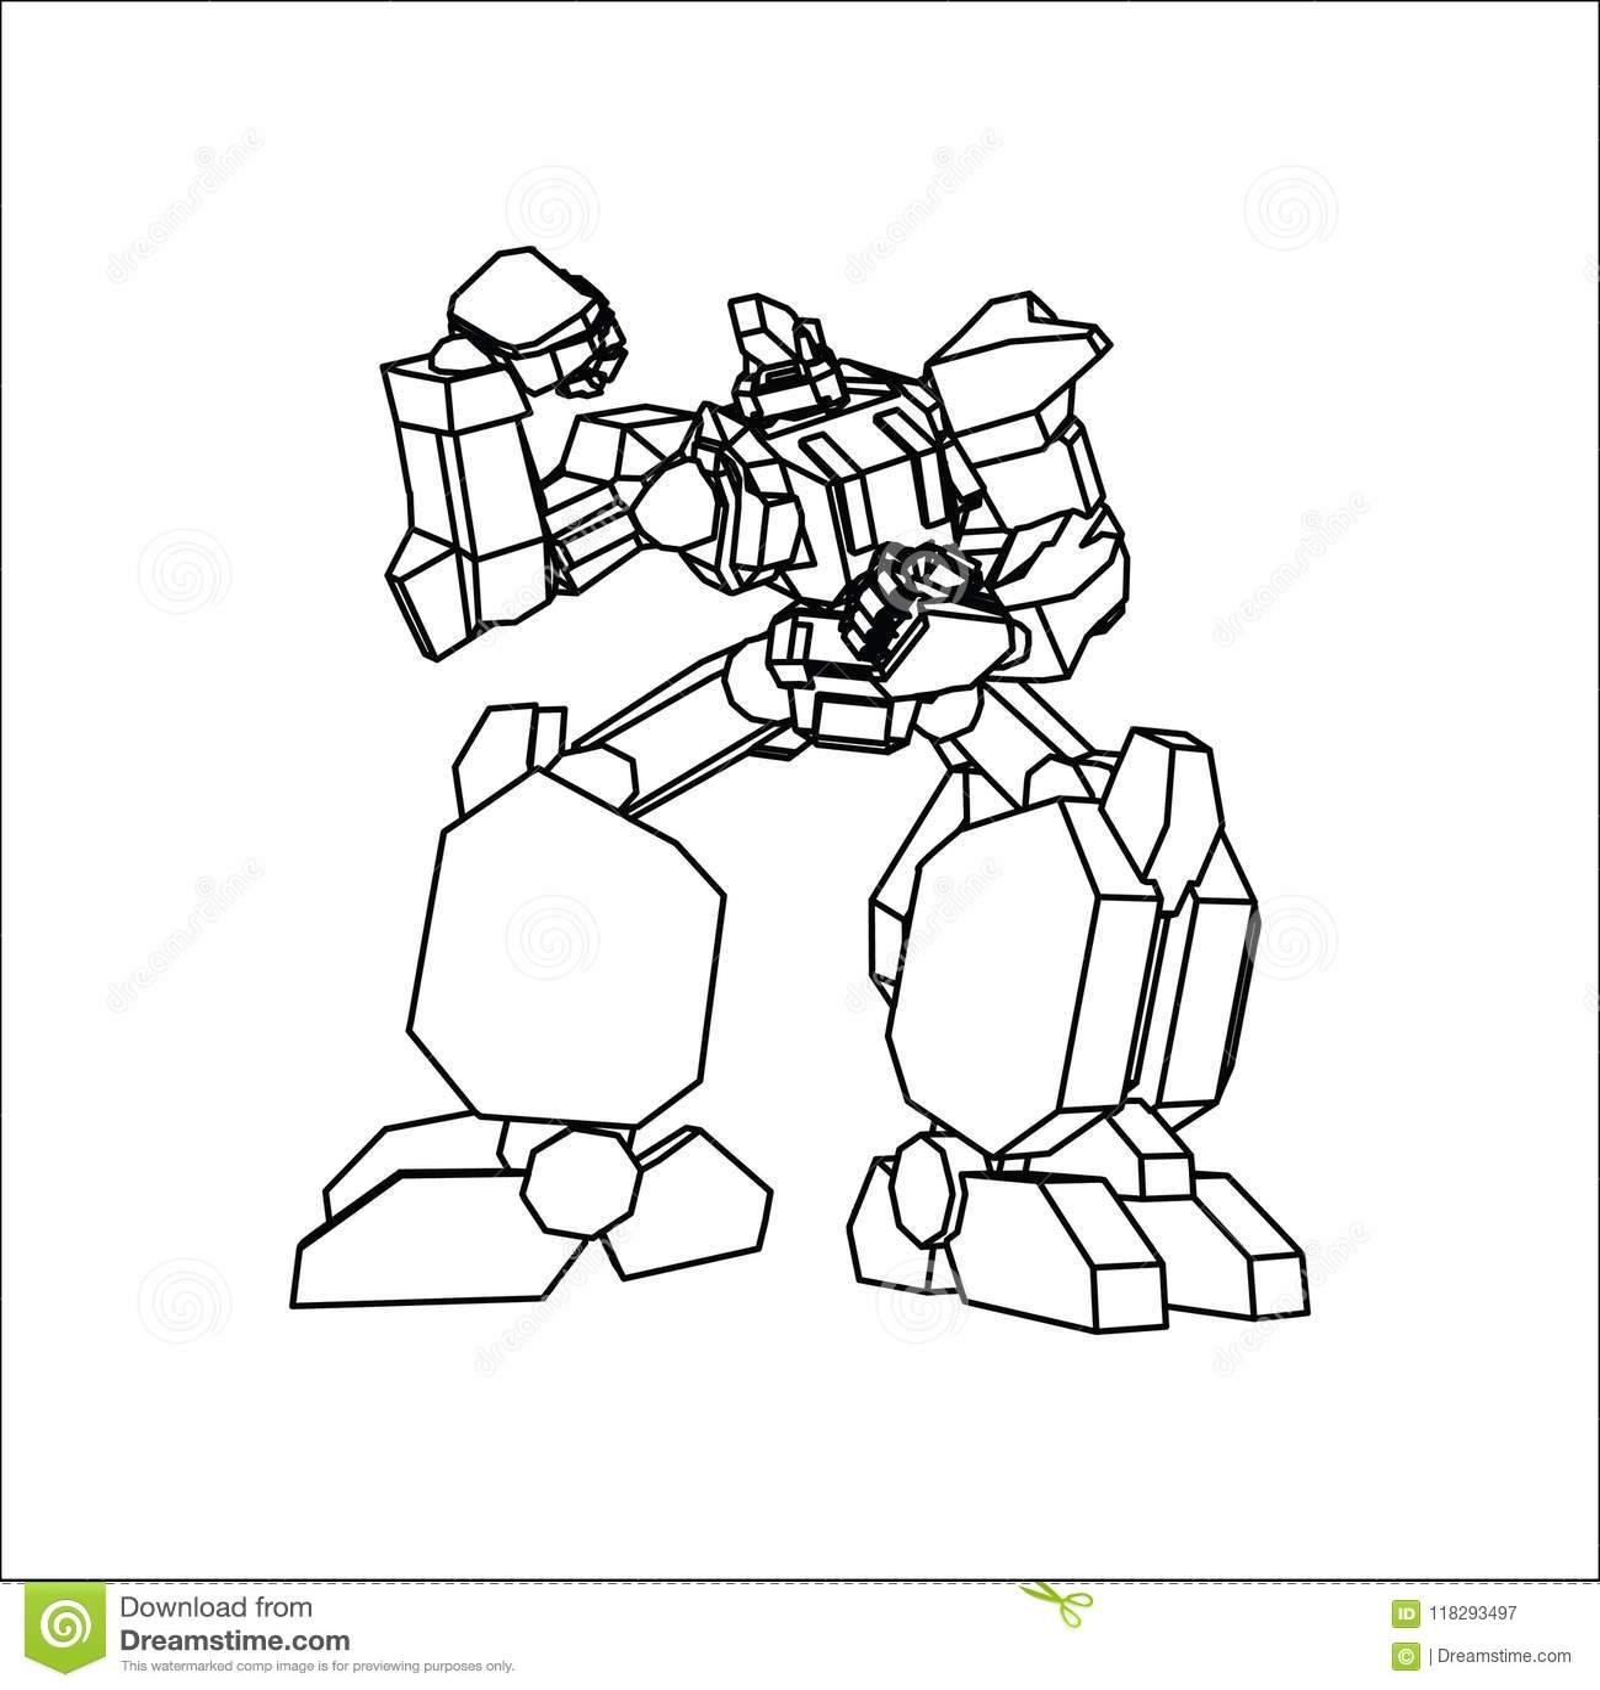 Línea arte del robot